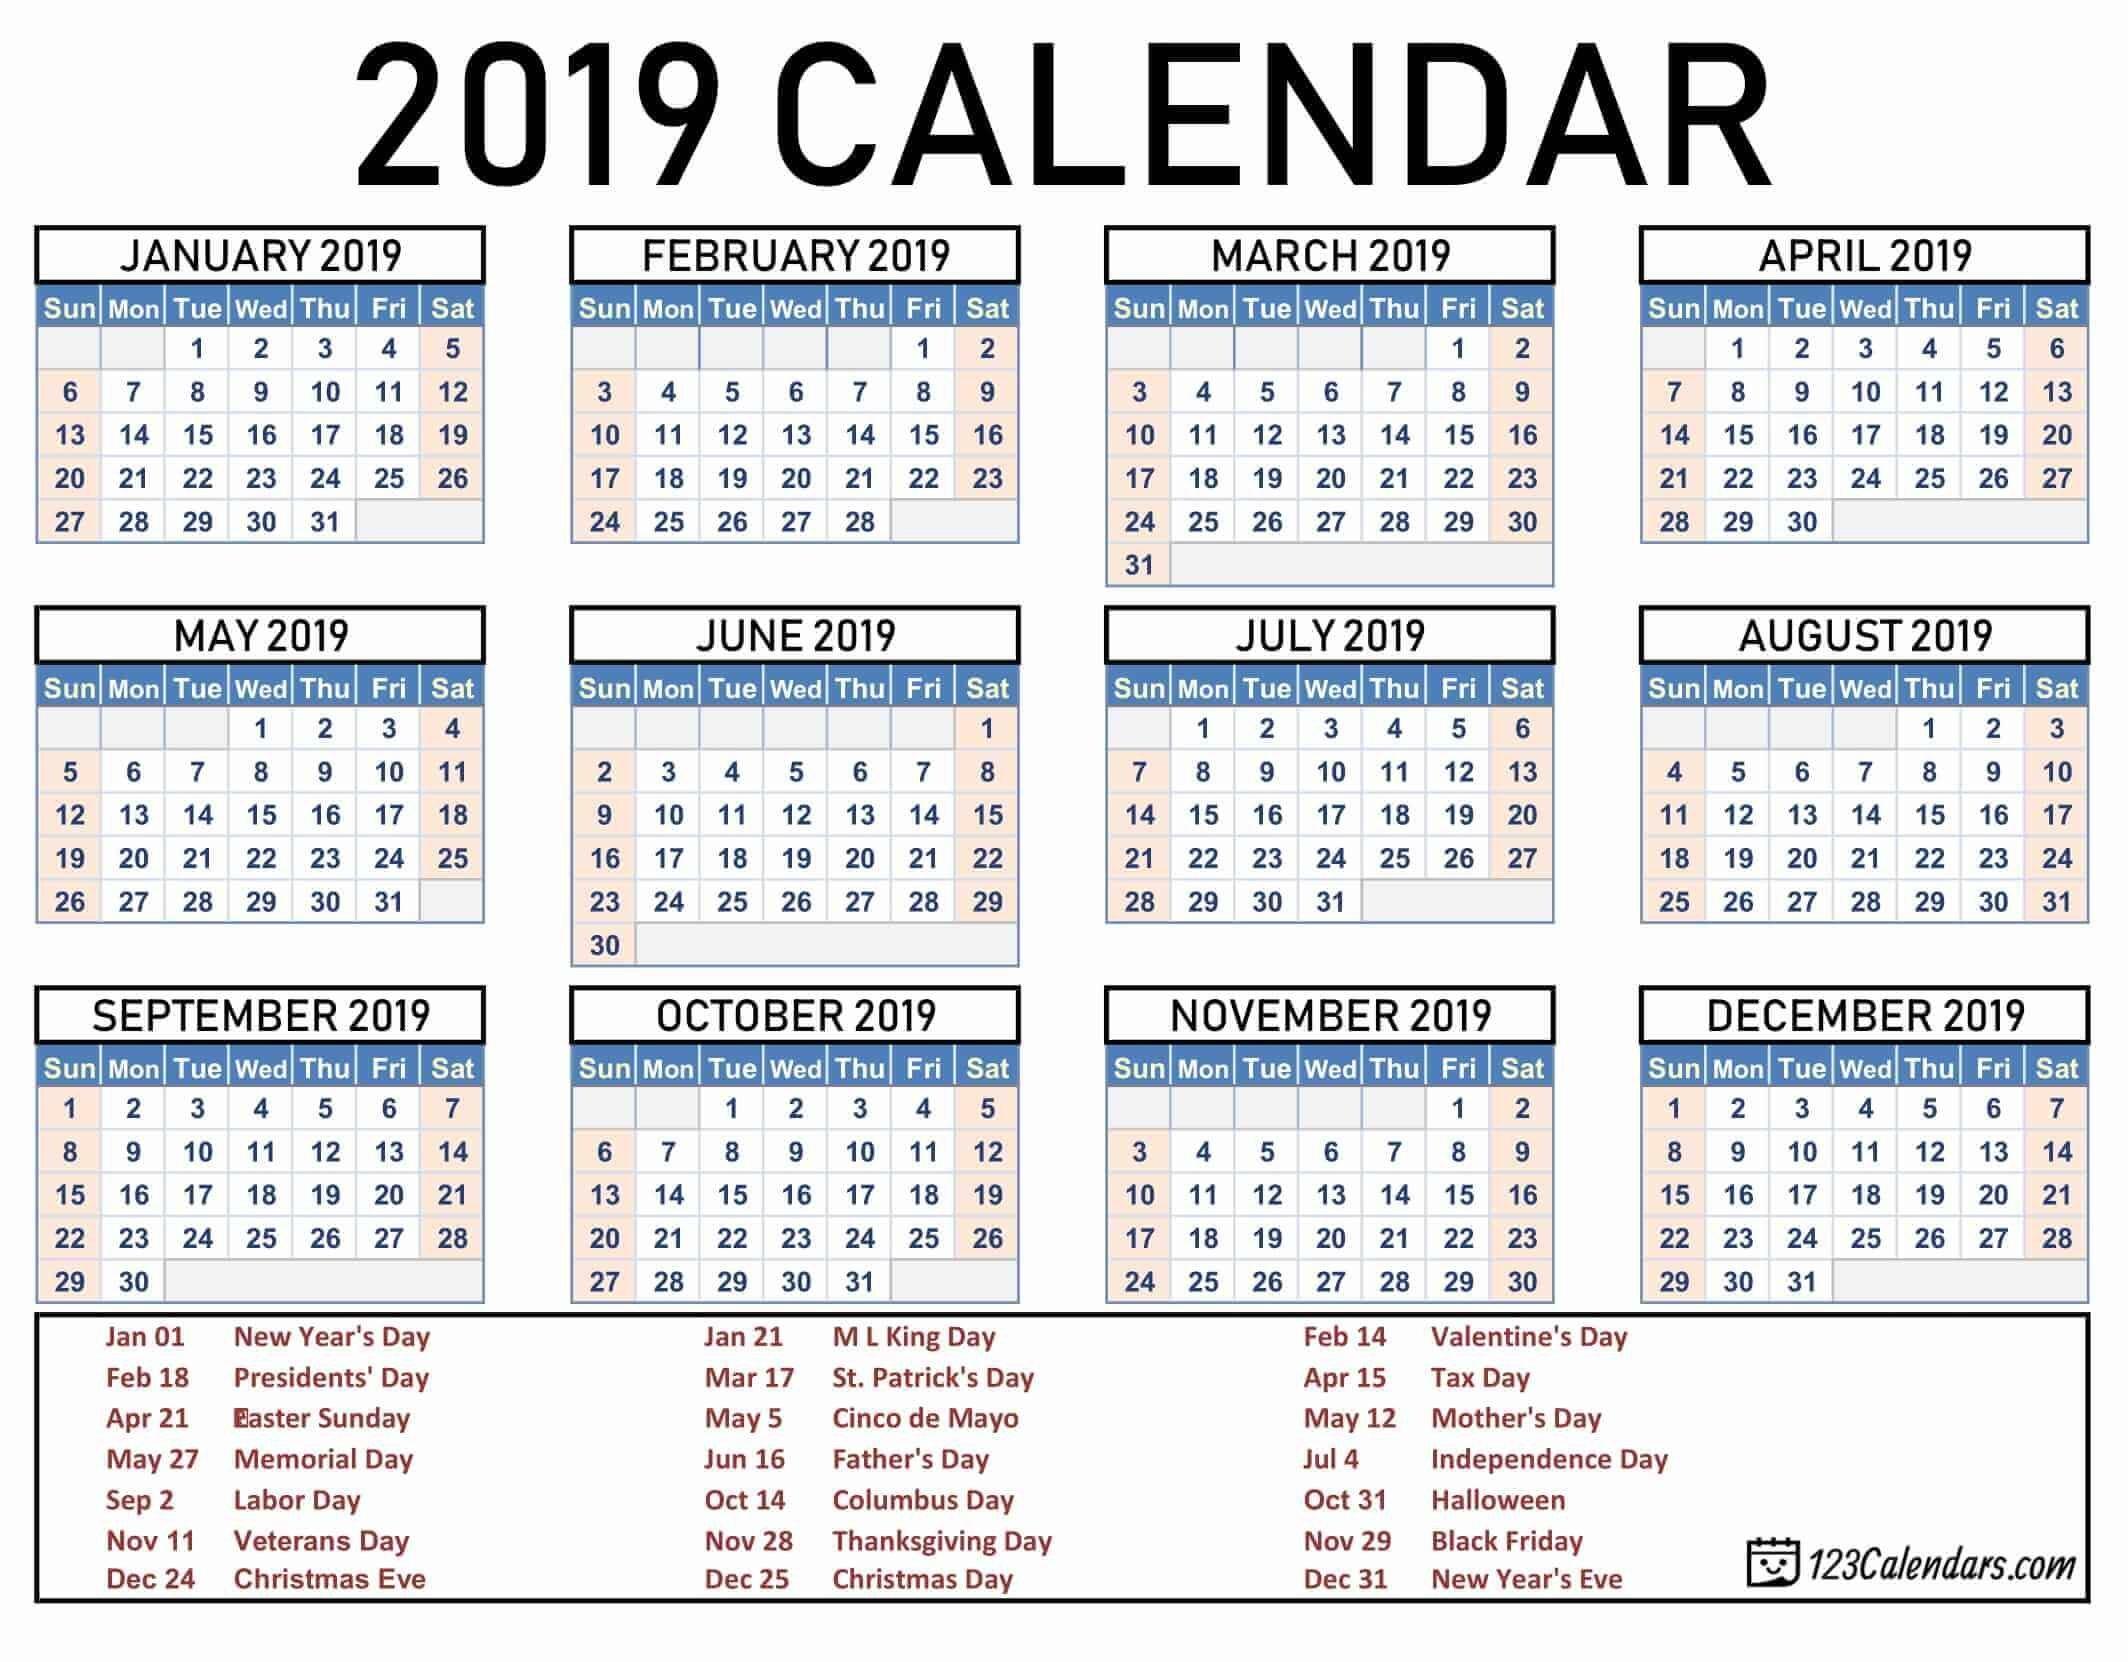 Year 2019 Printable Calendar Templates – 123Calendars Picture Of A 2019 Calendar